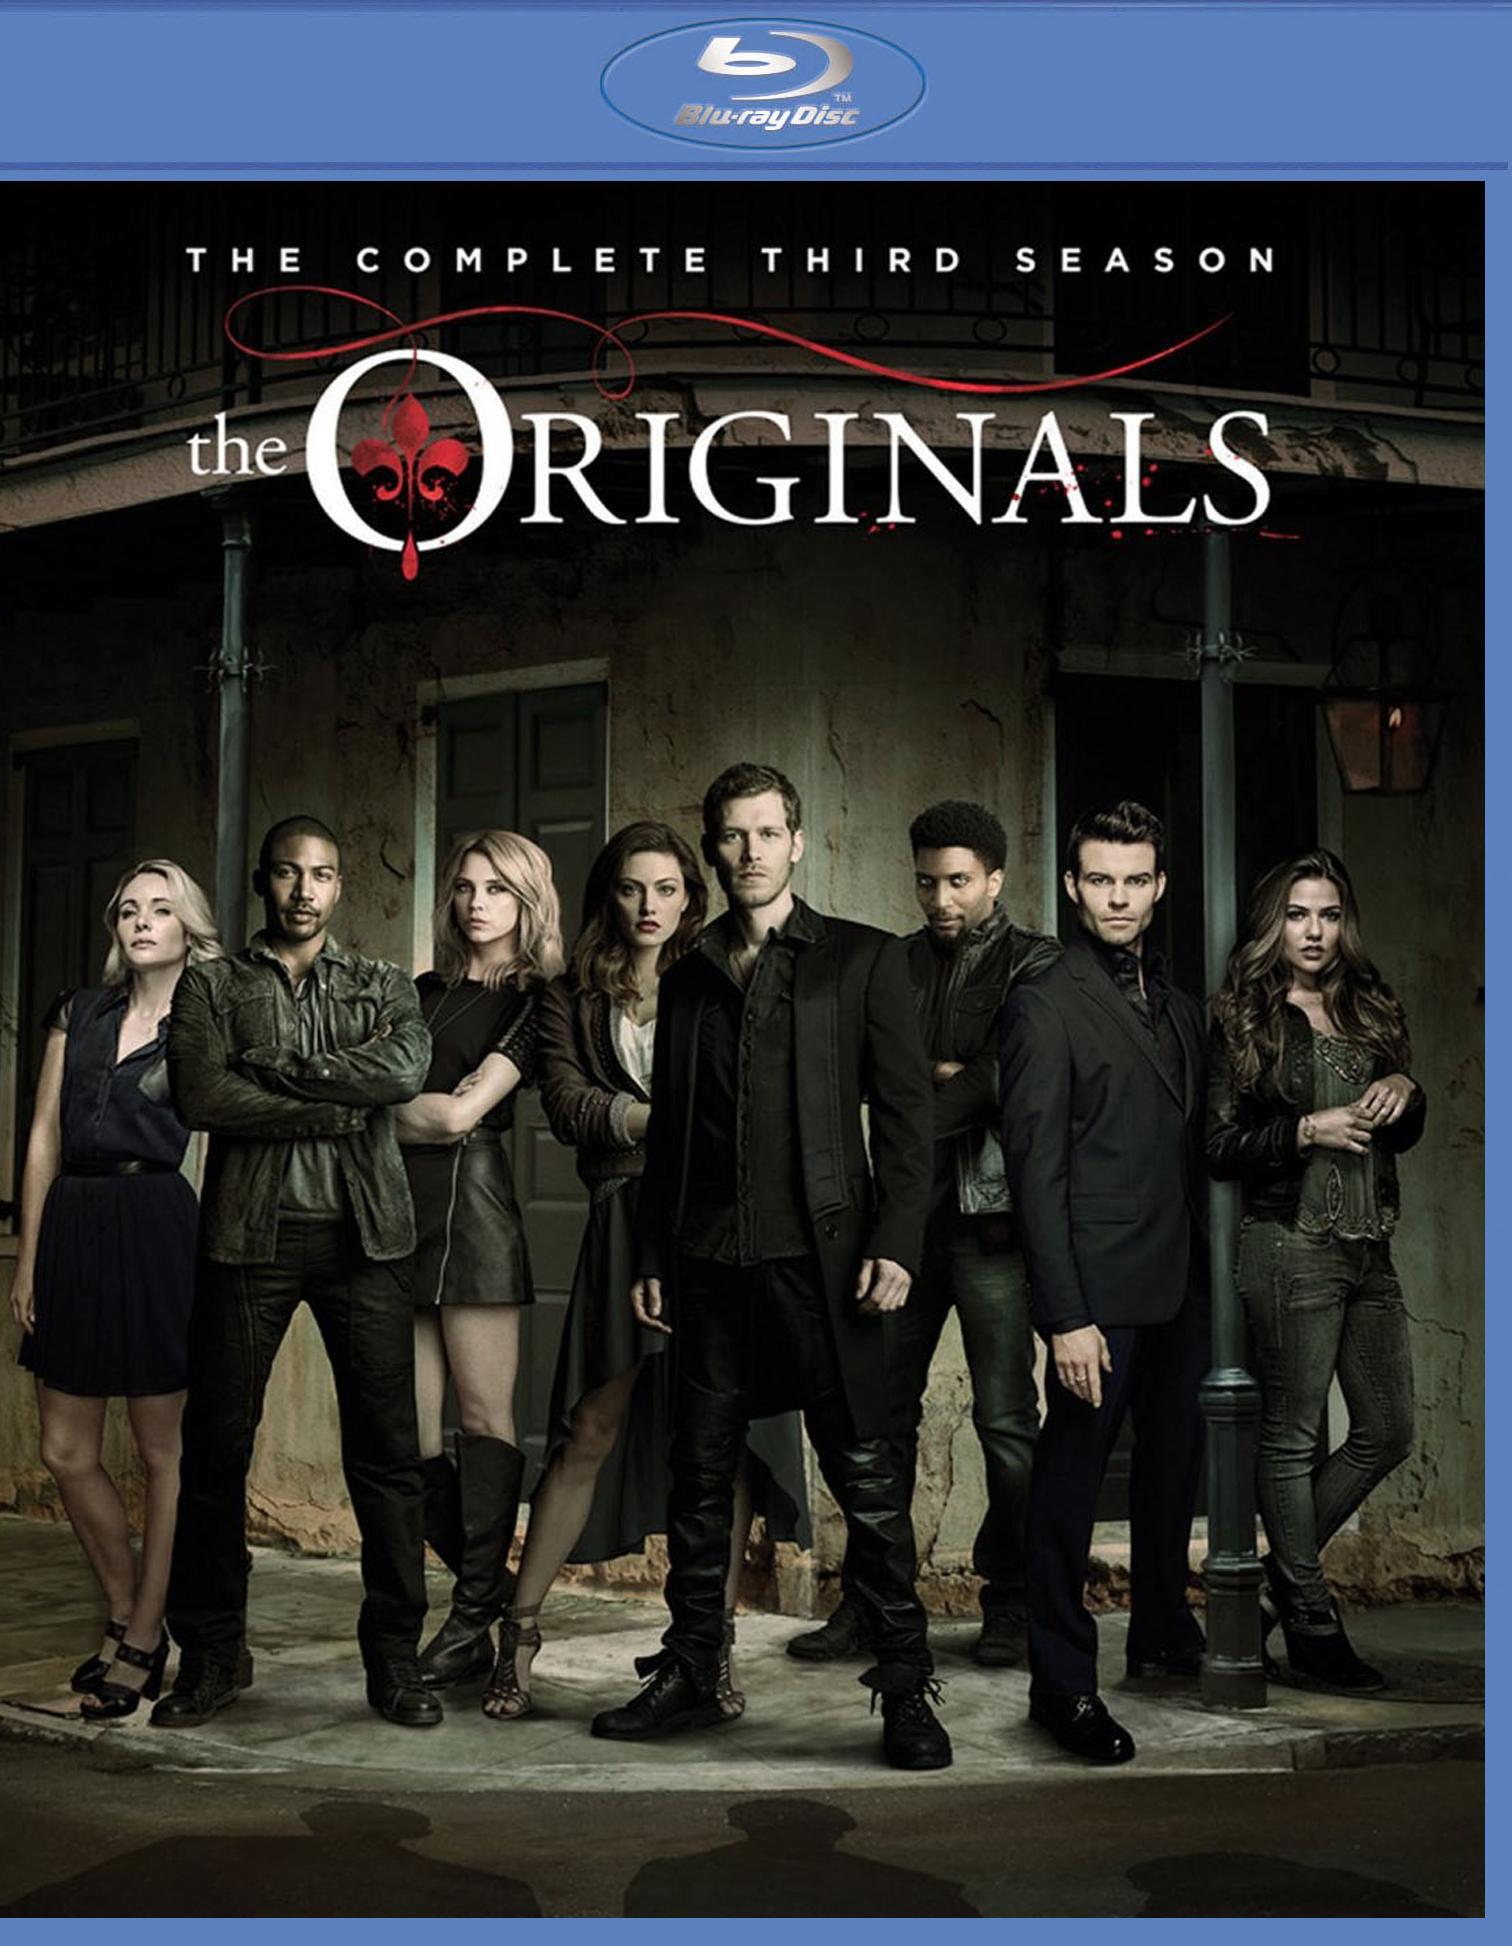 The Originals: The Complete Third Season [blu-ray] [5 Discs] 32128363